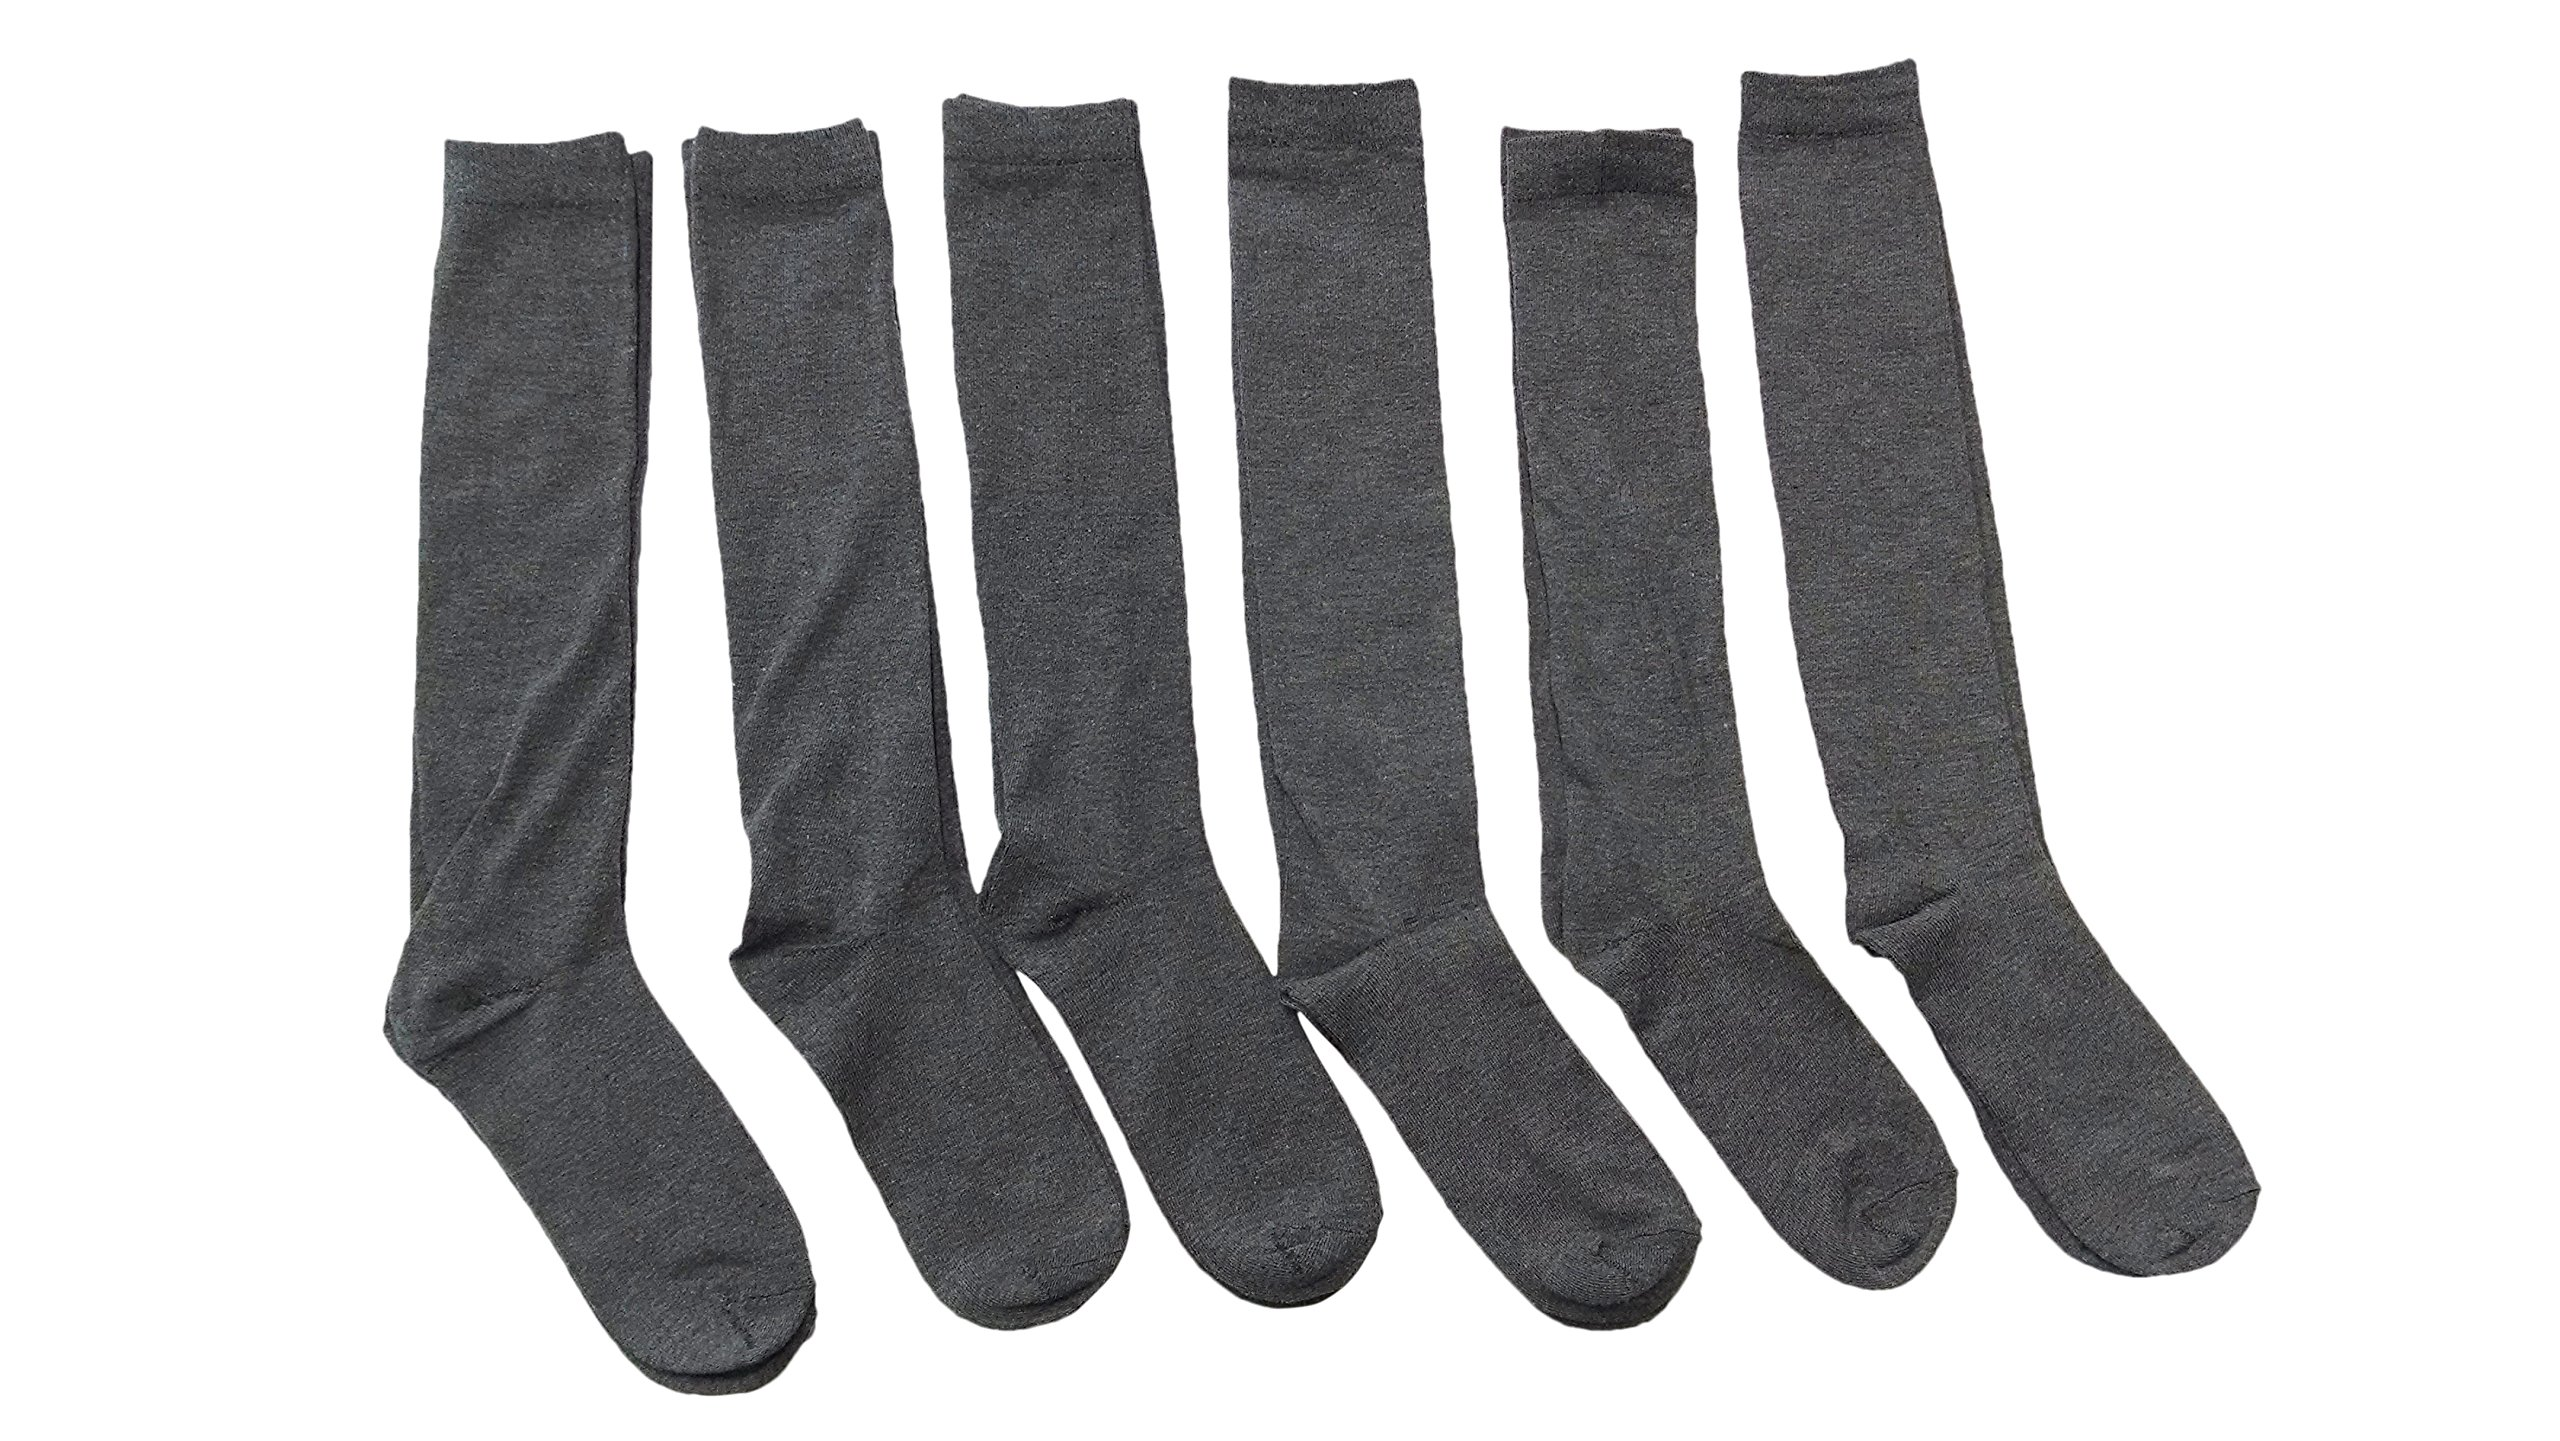 6 Pairs of Girls Knee High Socks, Cotton, Flat Knit, School Socks (9-11,Gray)